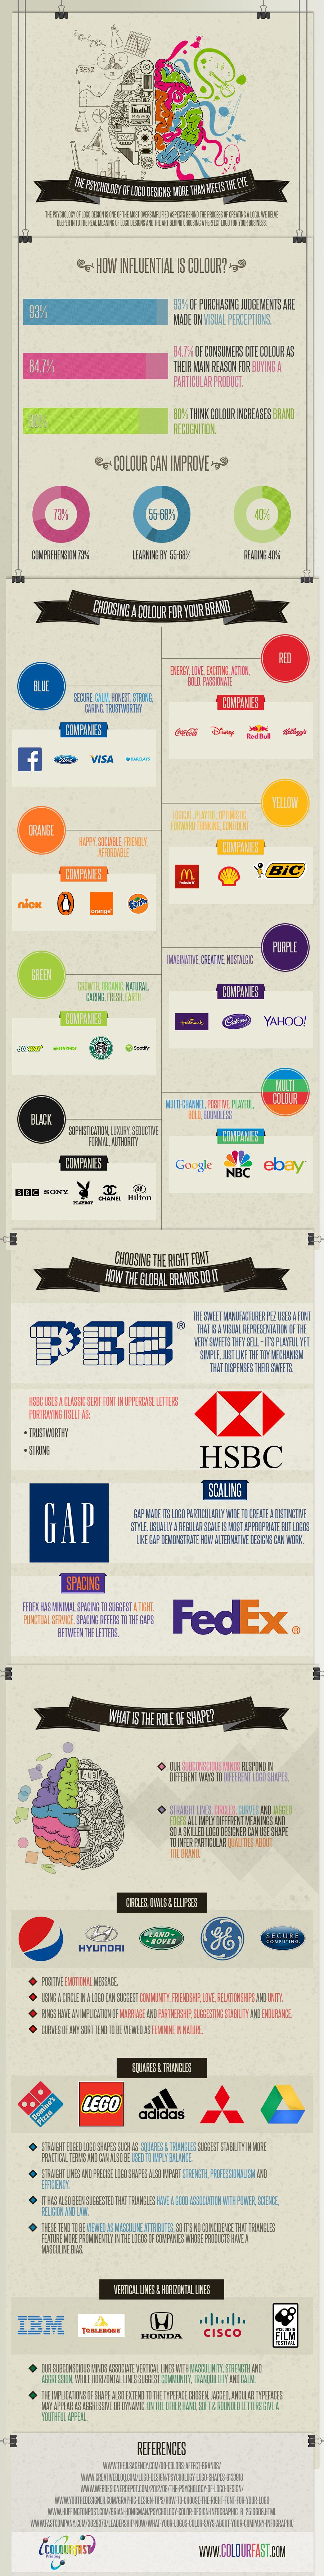 The Psychology of Logo Design